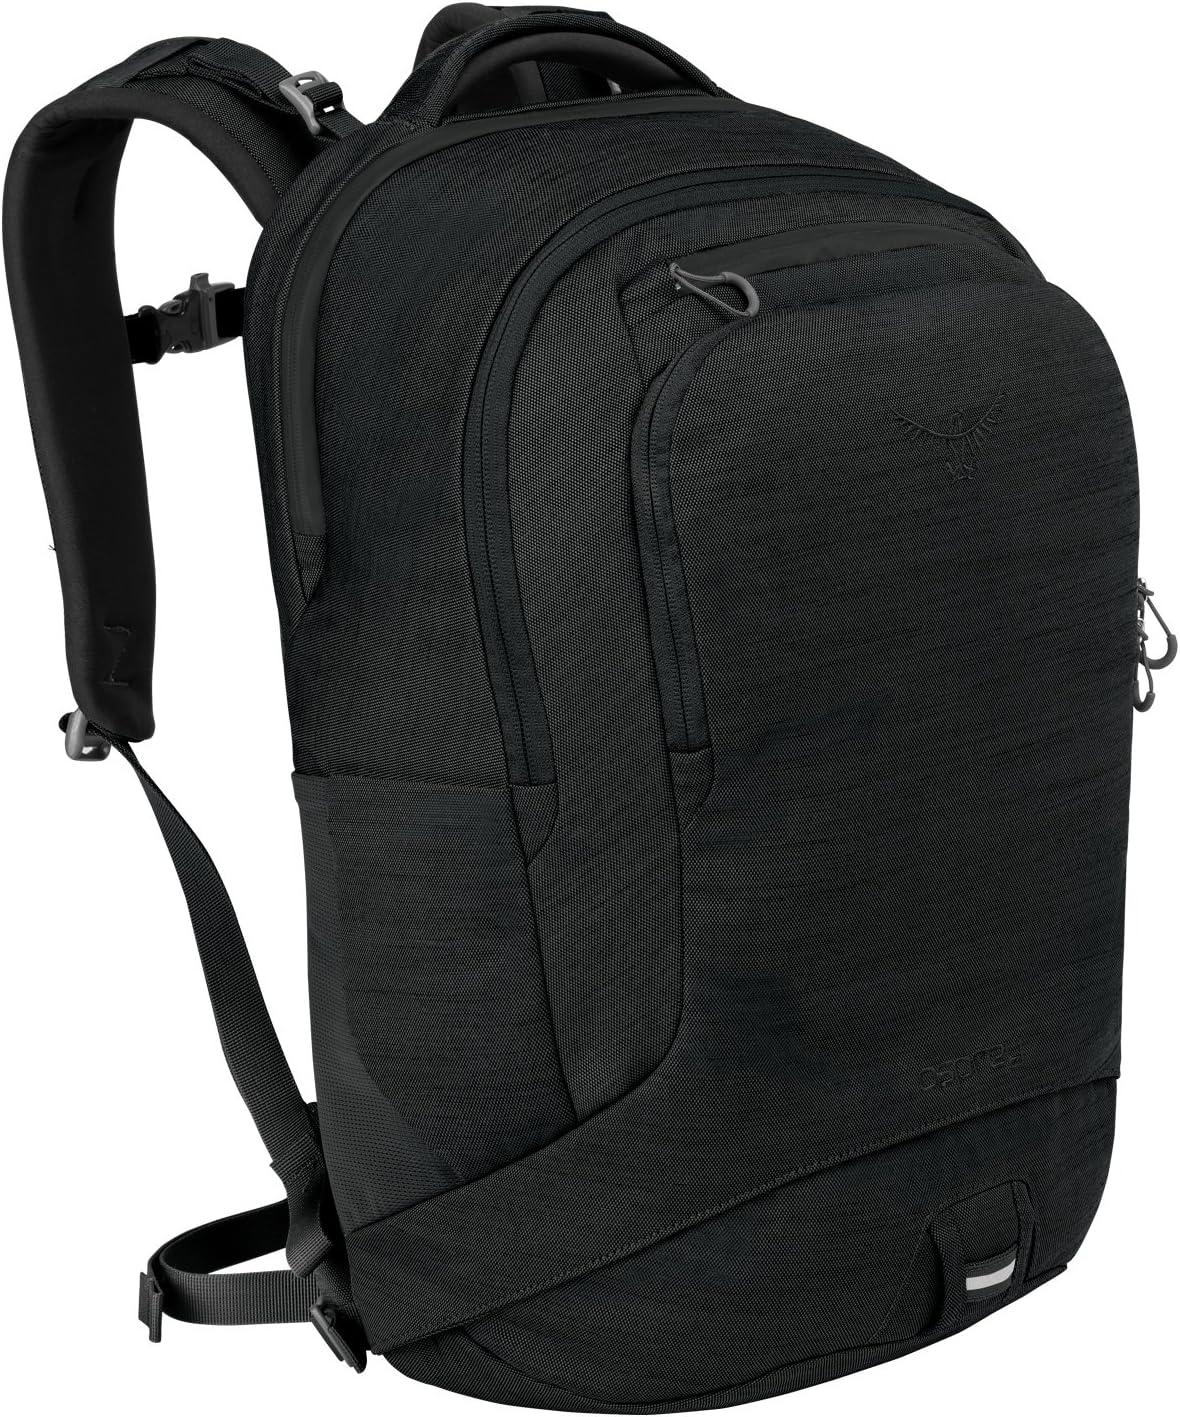 Osprey Cyber Backpack